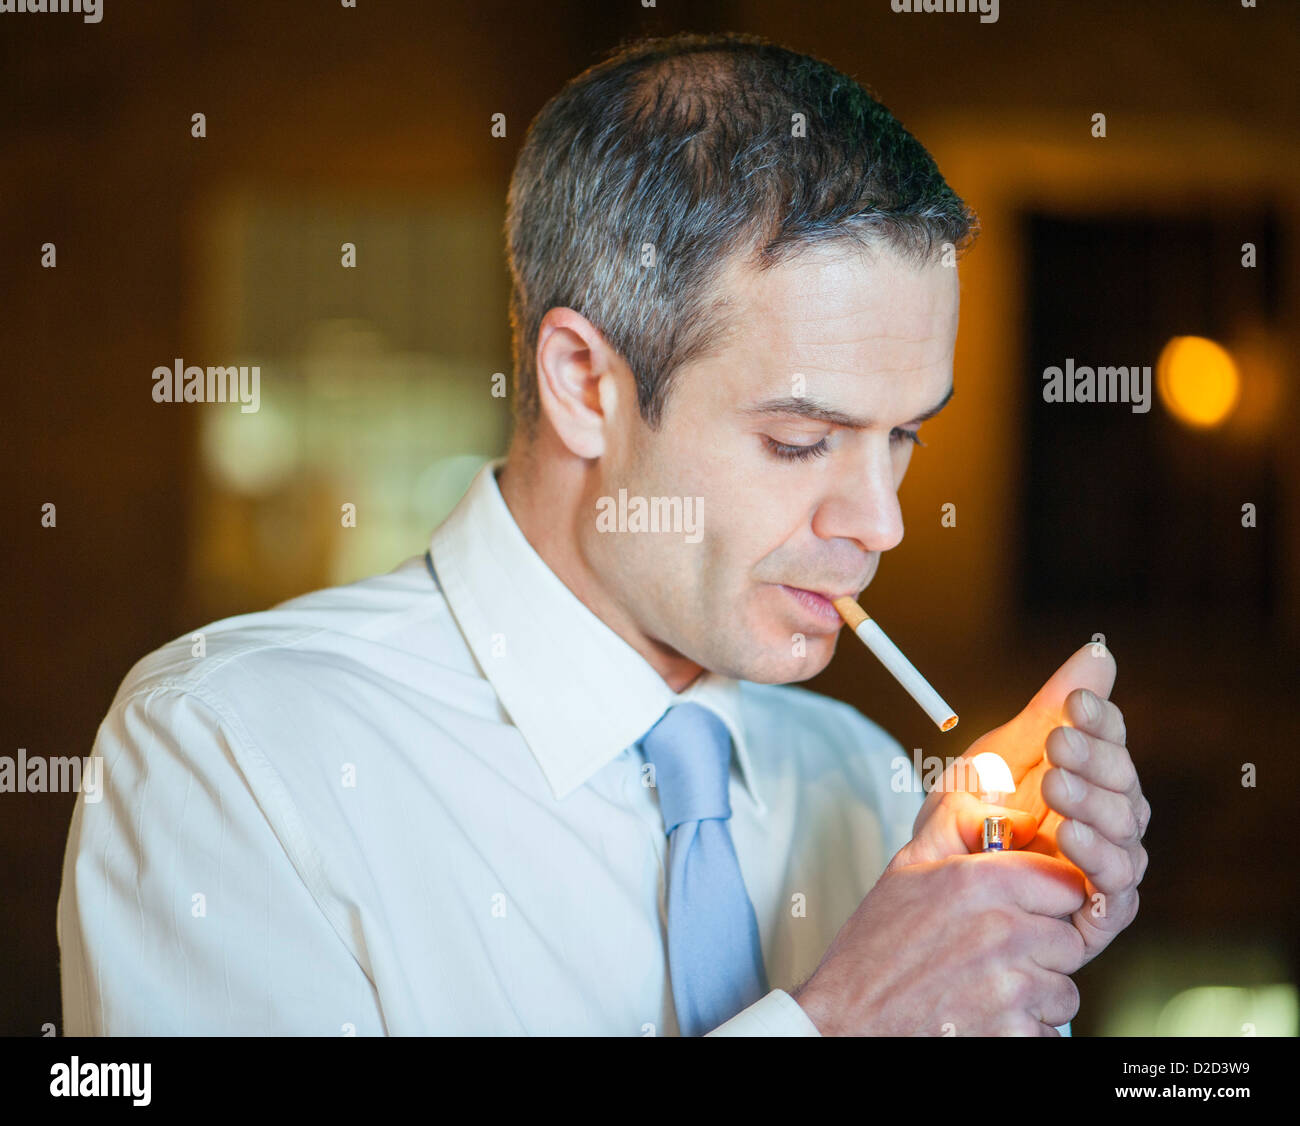 MODEL RELEASED Man lighting a cigarette - Stock Image